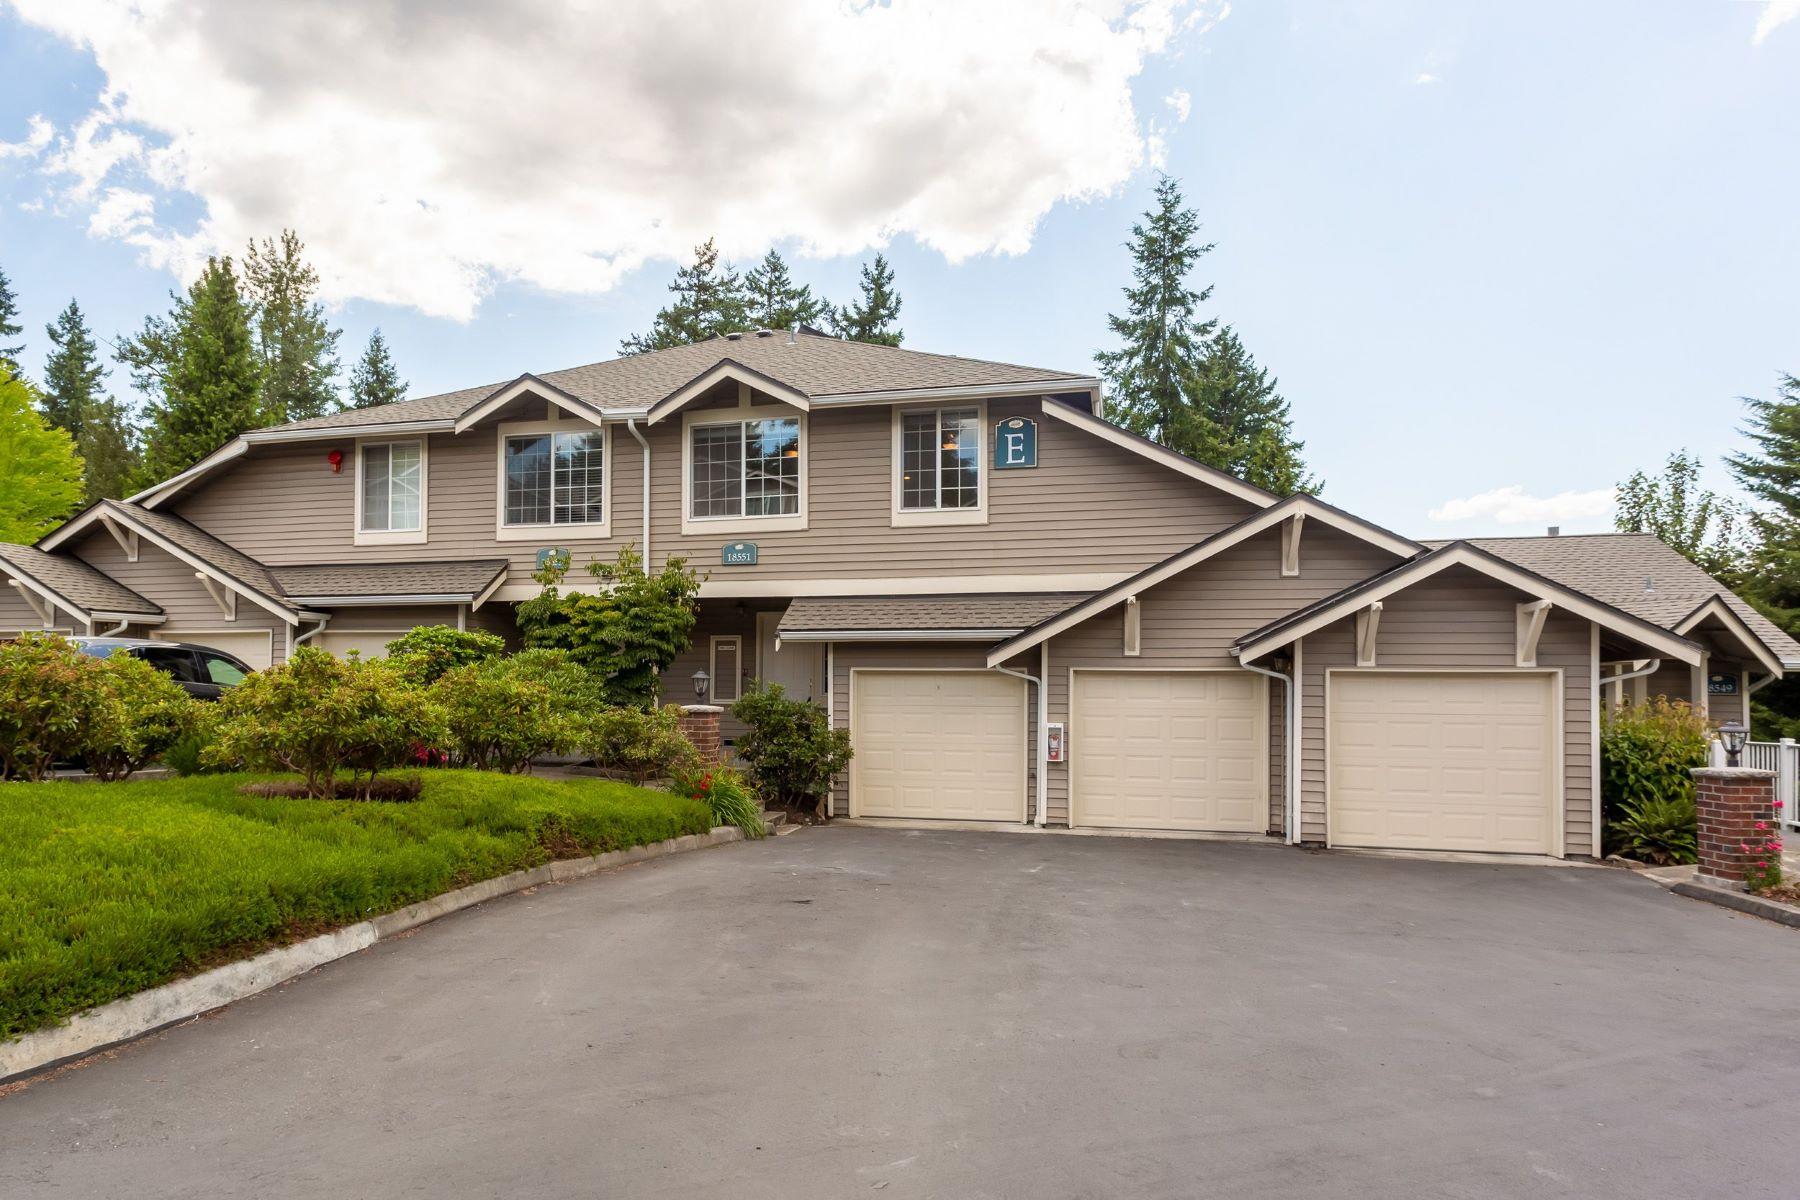 Condominiums for Sale at 18551 NE 57th St, Redmond, WA 98052 18551 NE 57th St Redmond, Washington 98052 United States